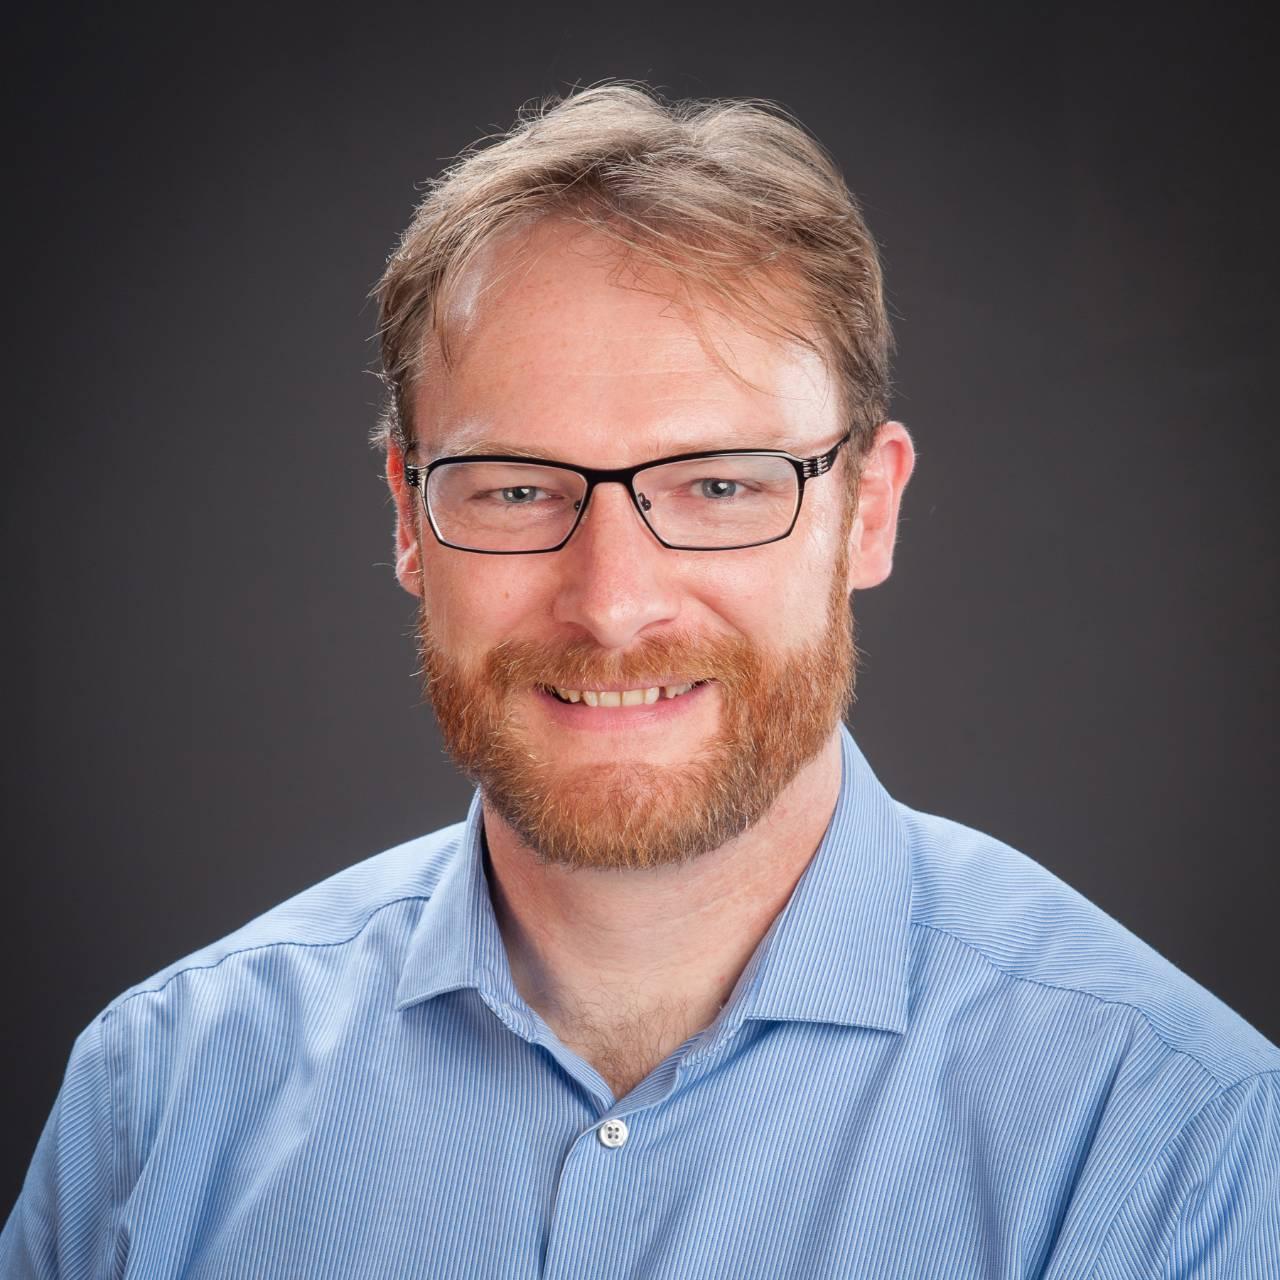 Hamish Cameron profile picture photograph